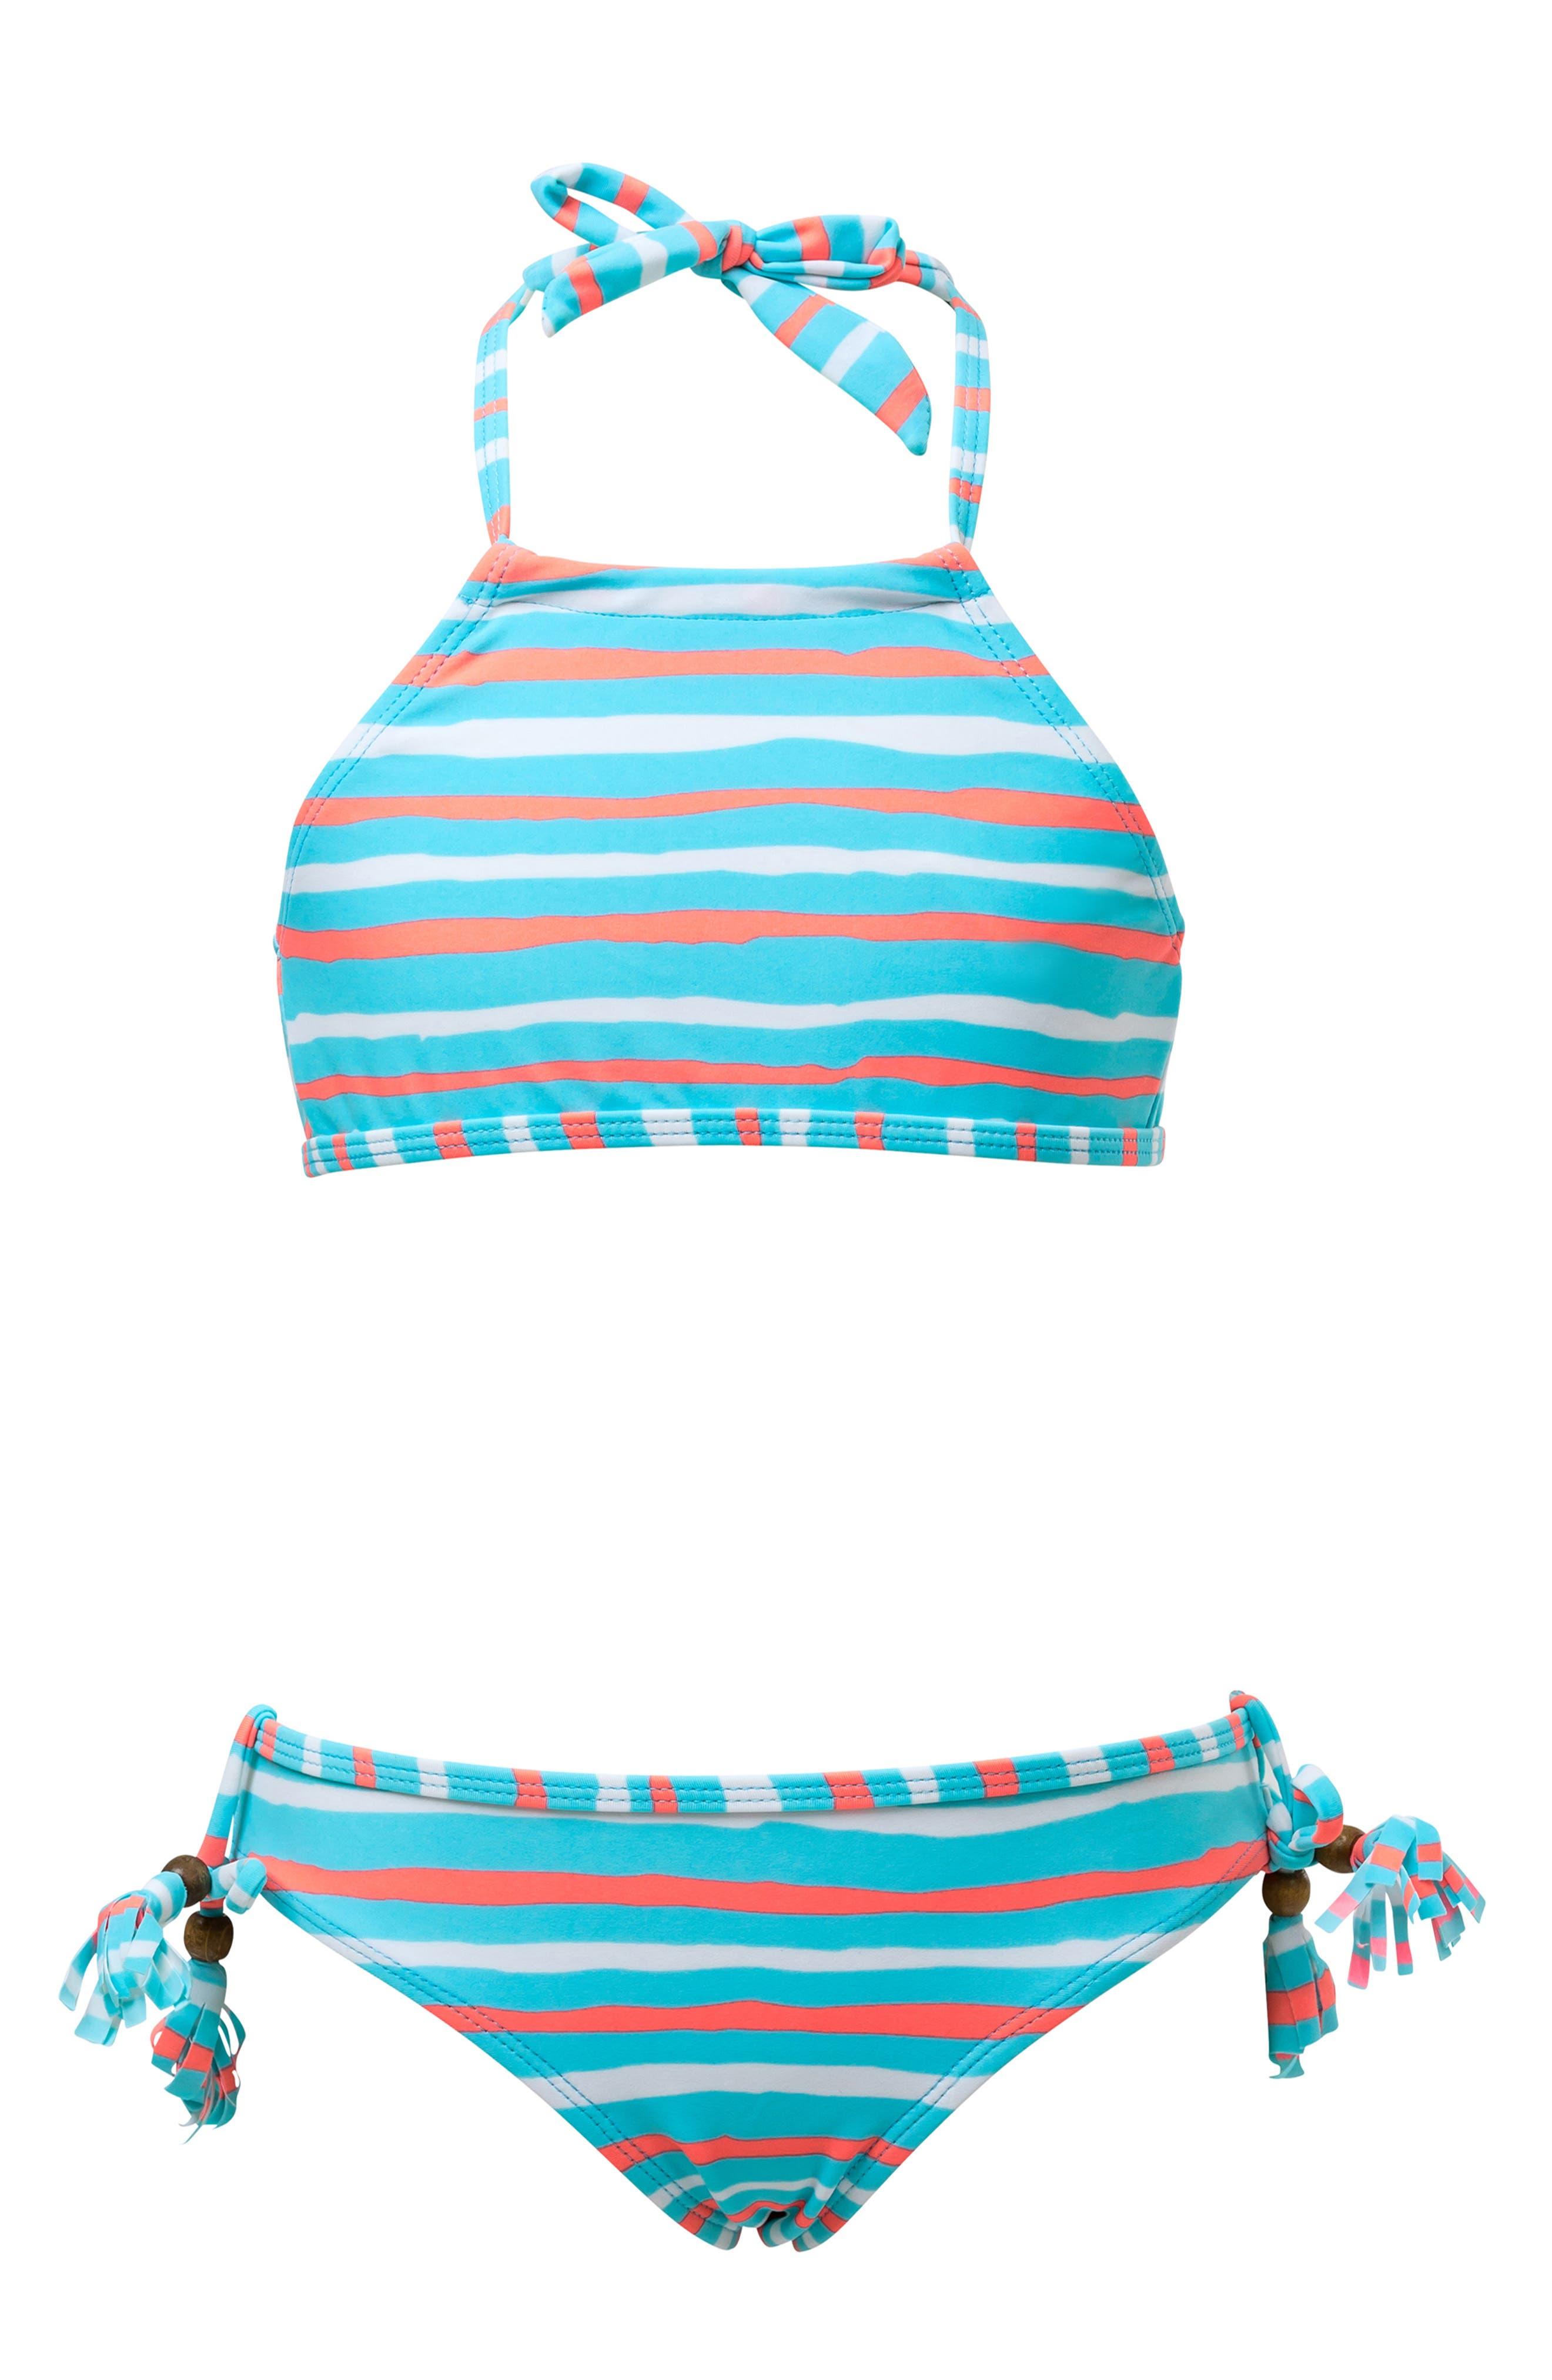 SNAPPER ROCK,                             Stripe Two-Piece Halter Swimsuit,                             Main thumbnail 1, color,                             NEON LIGHT BLUE